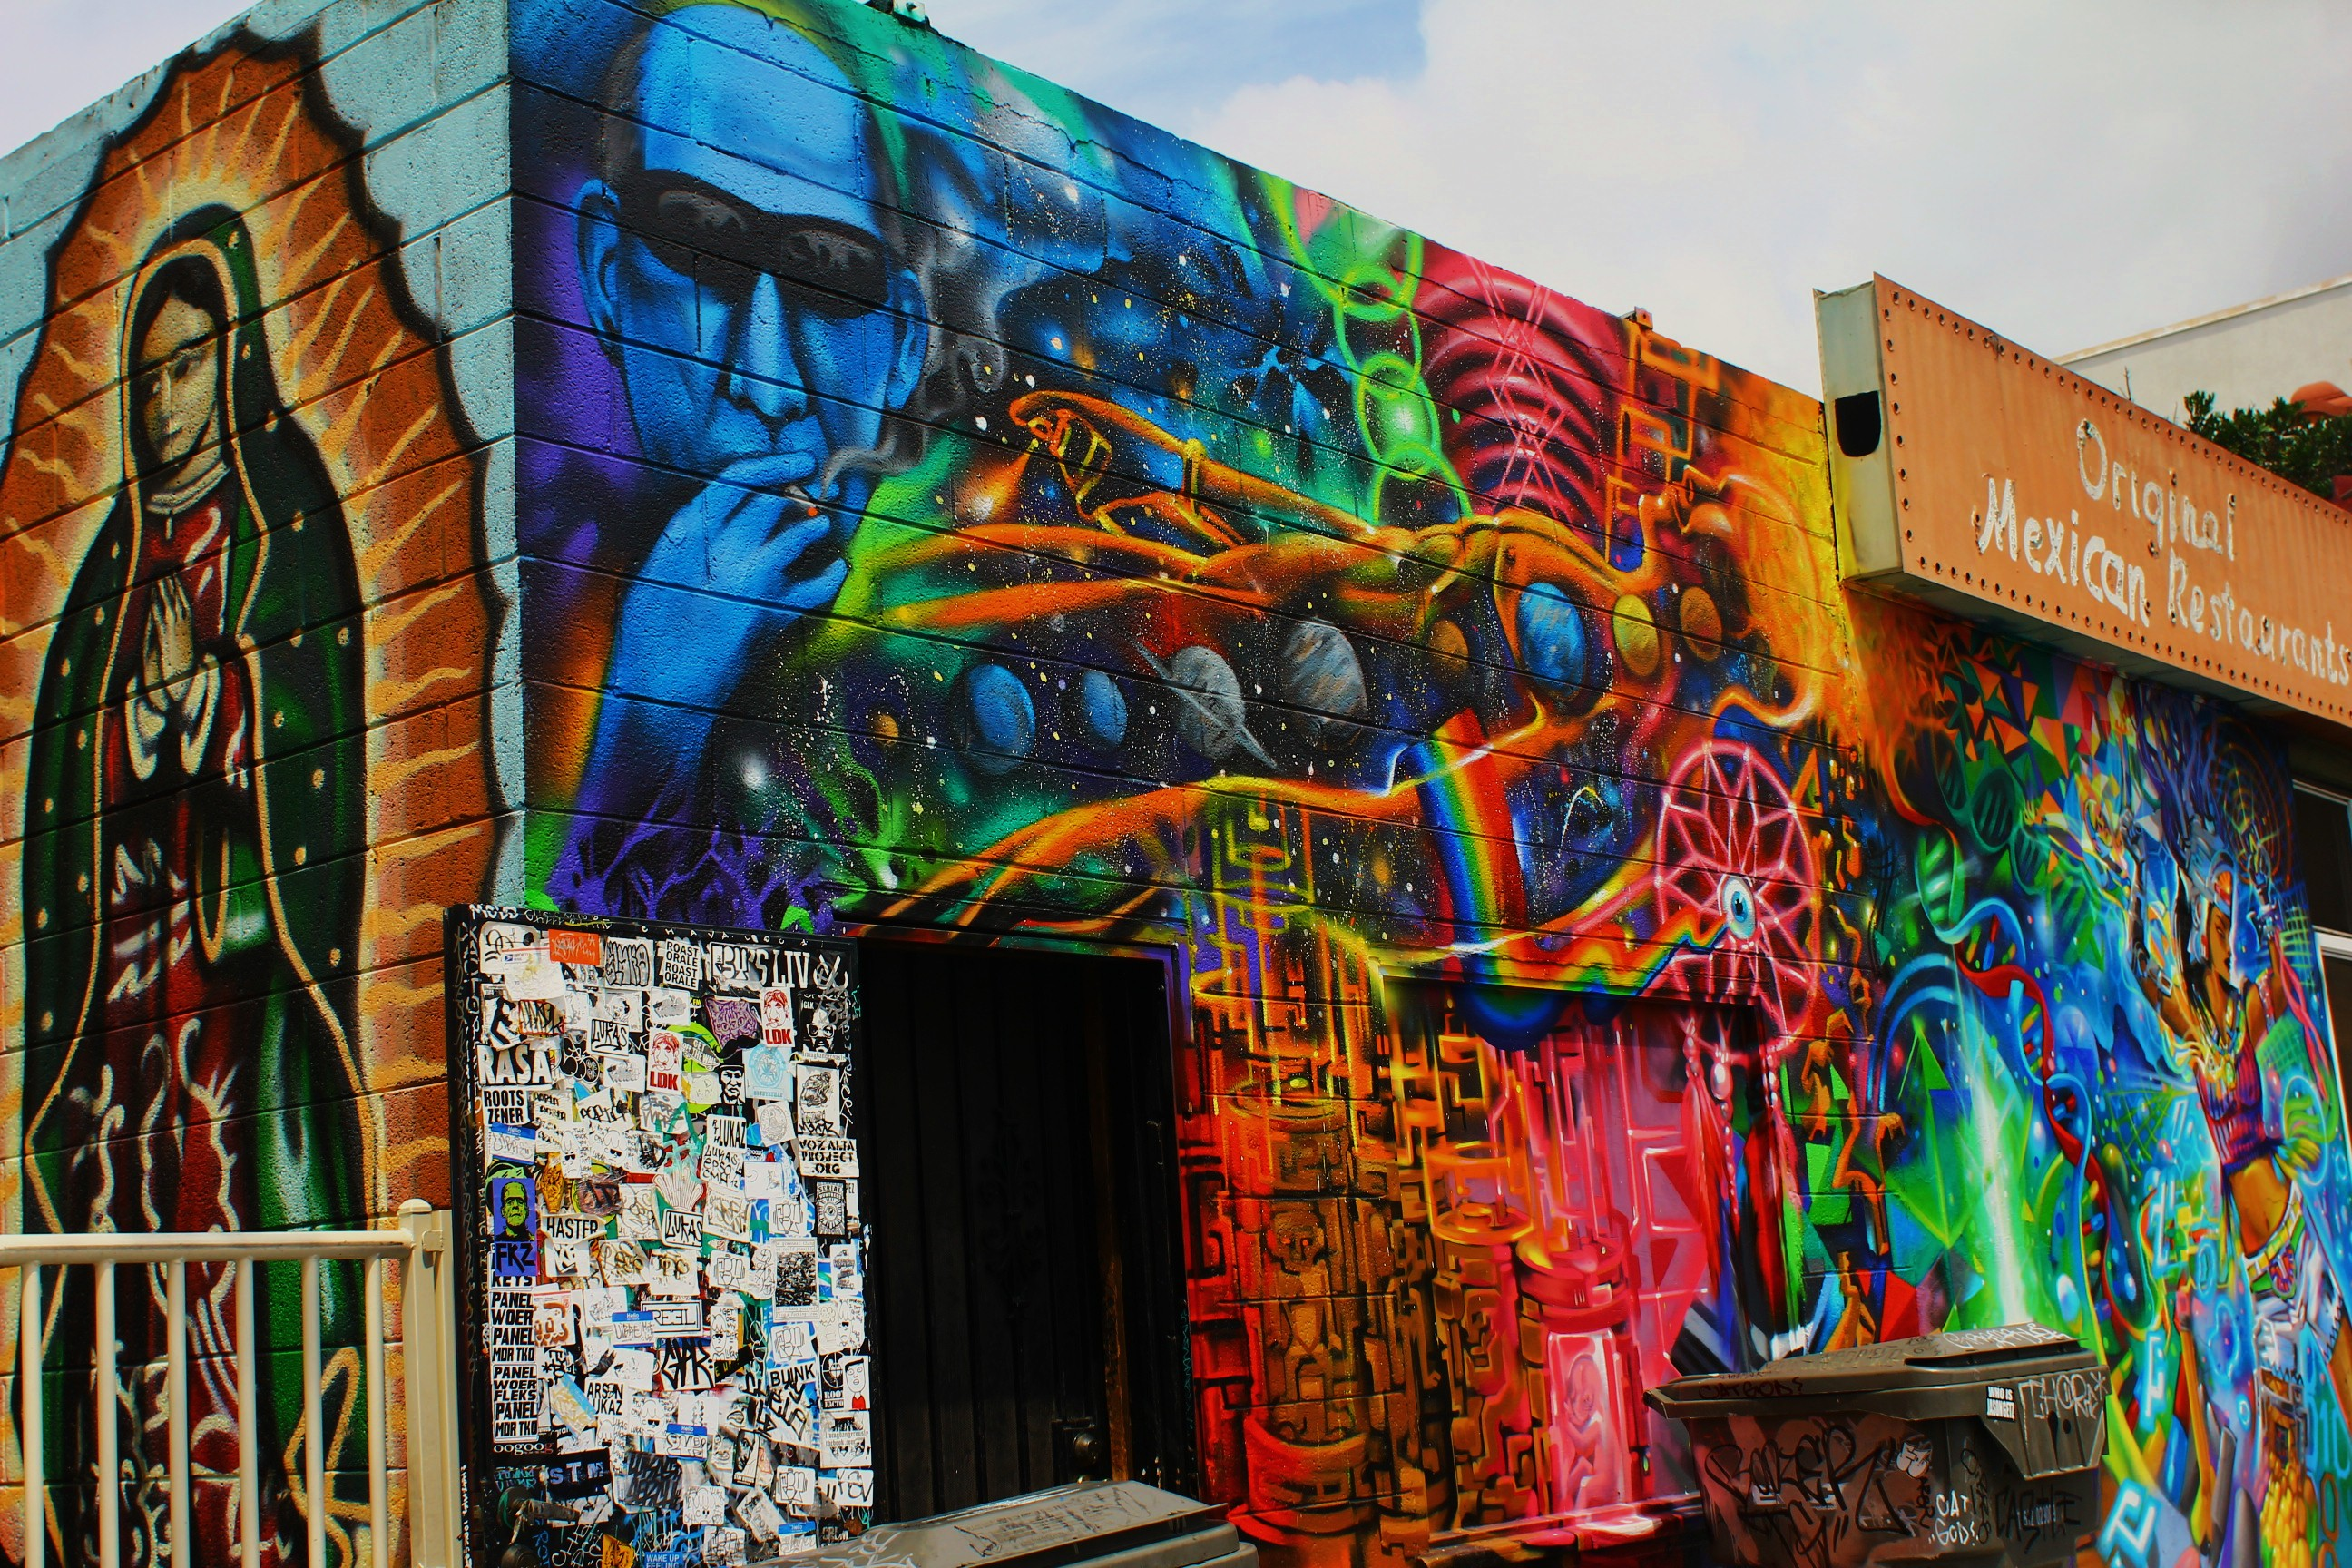 san diego street art mystical mural on pokez restaurant the talking walls memory care murals in san diego